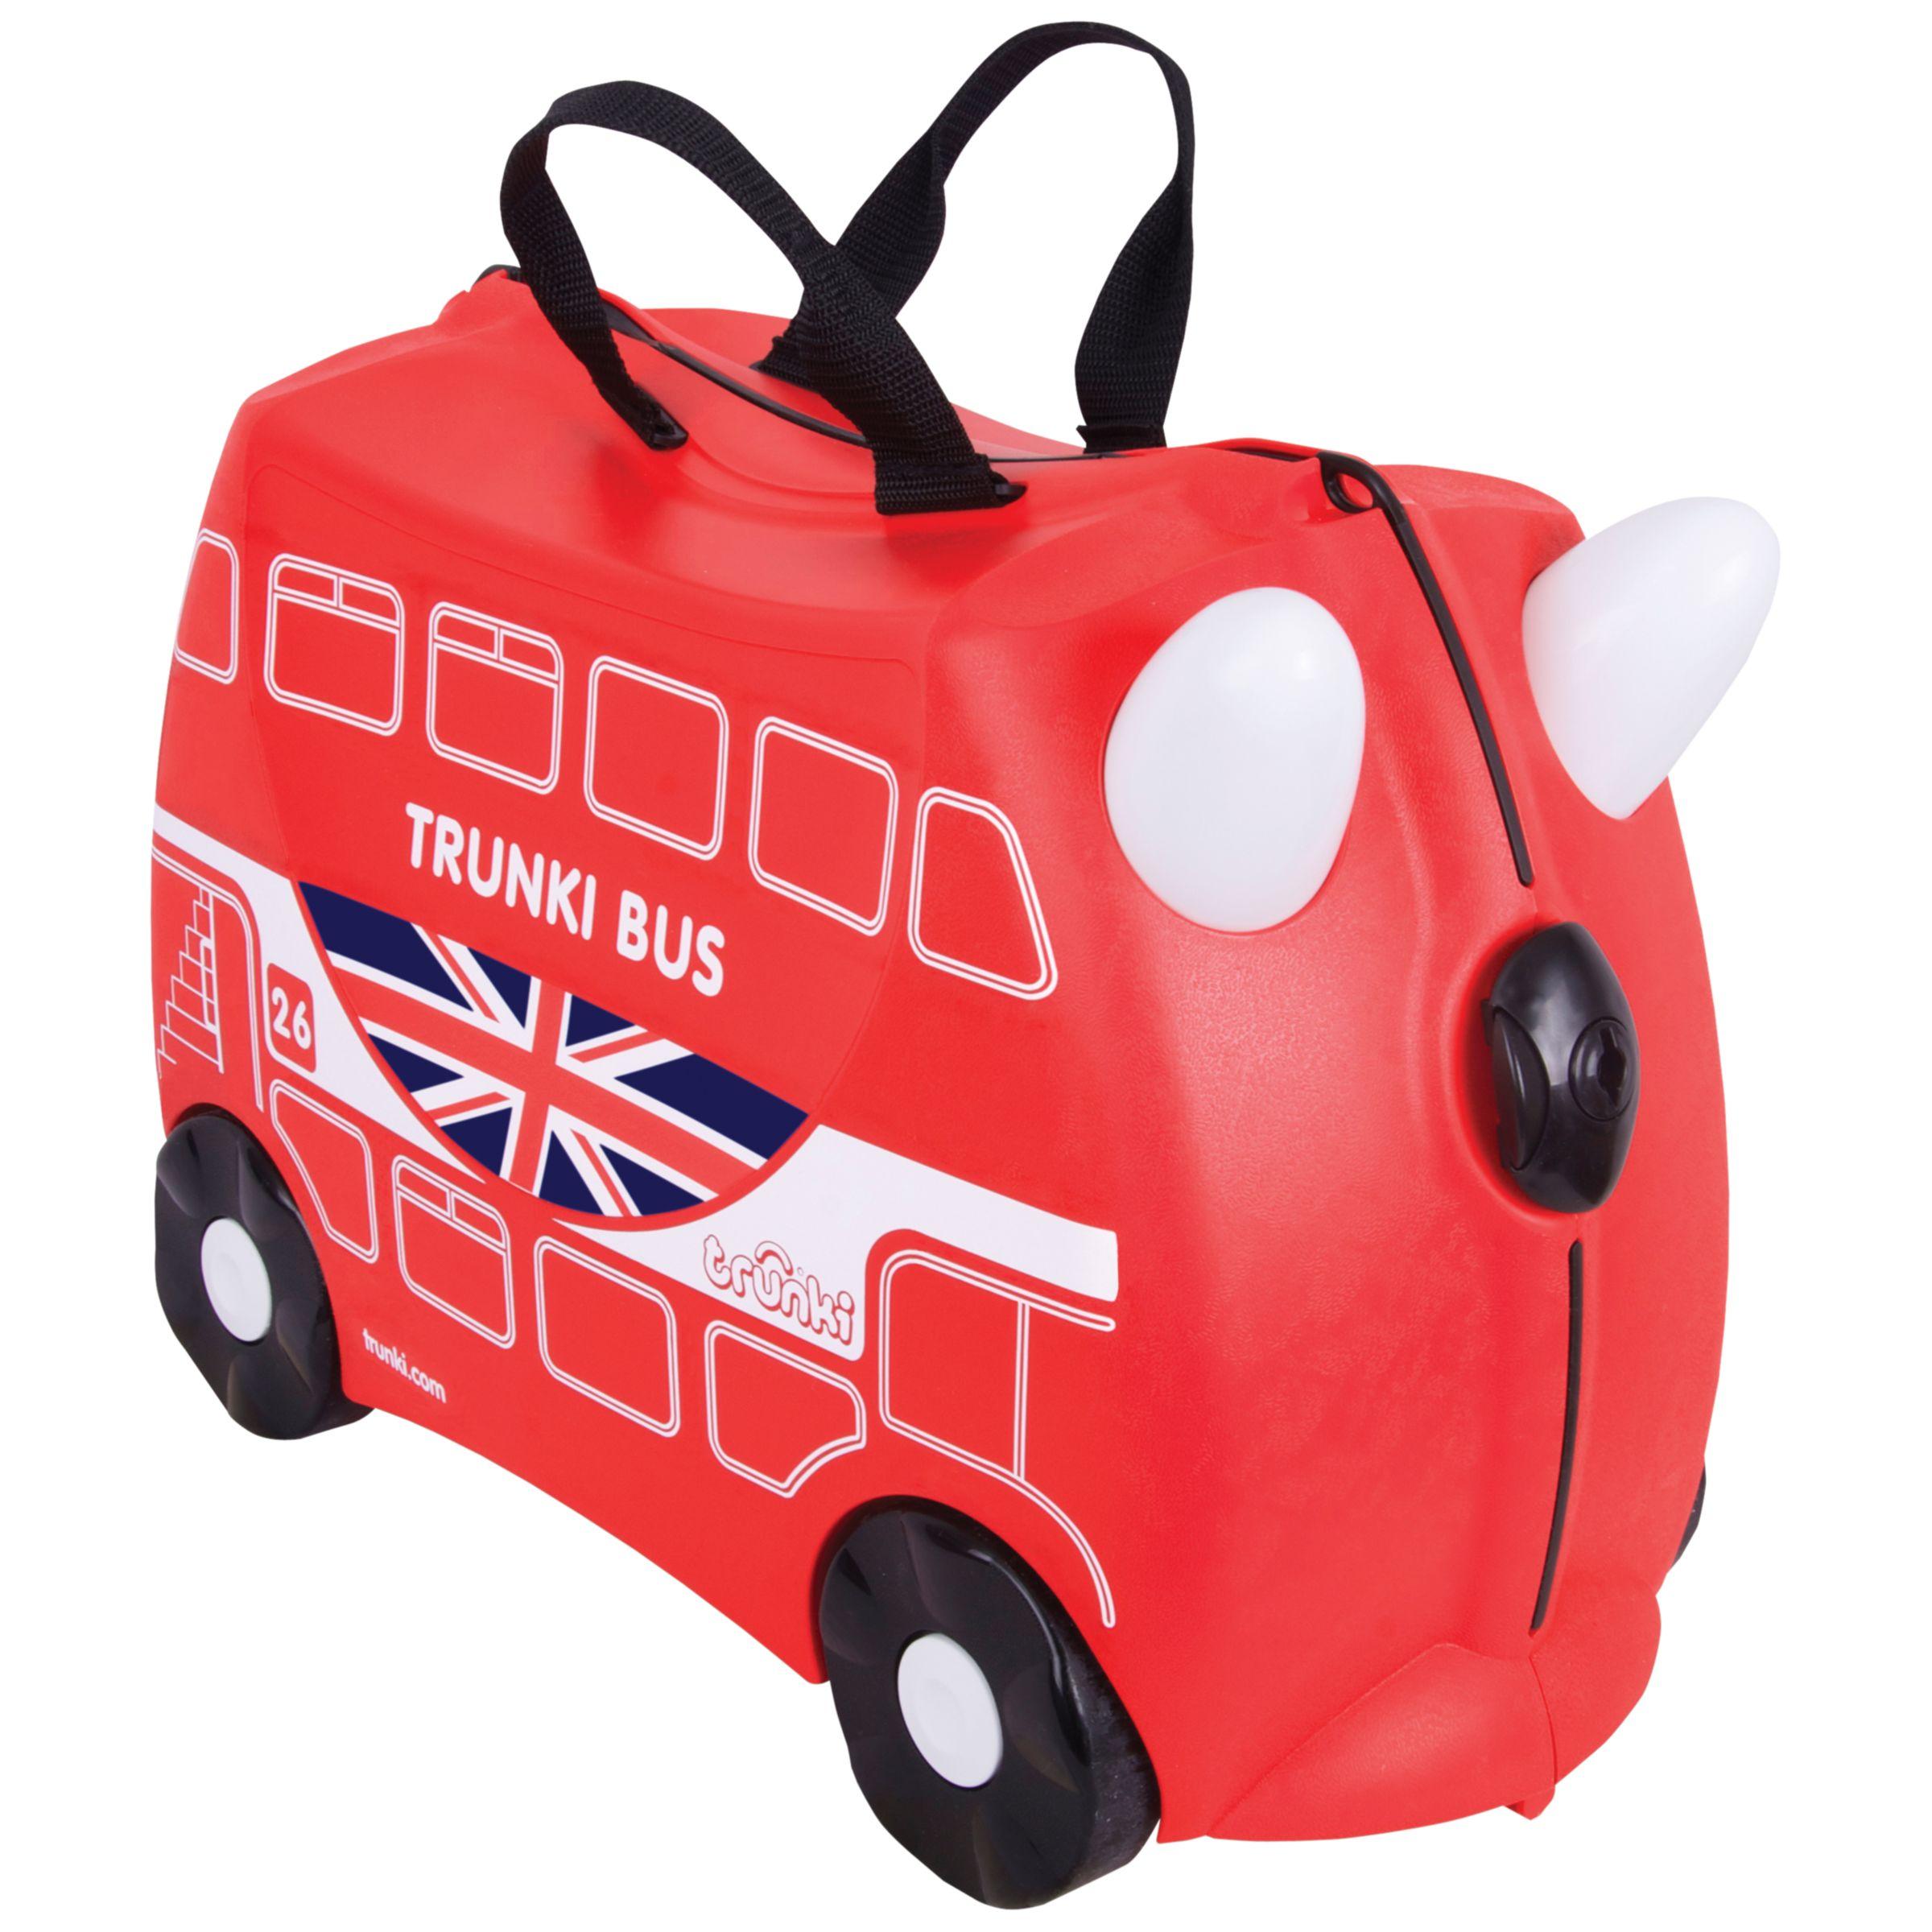 Trunki Trunki Boris The Bus, Red